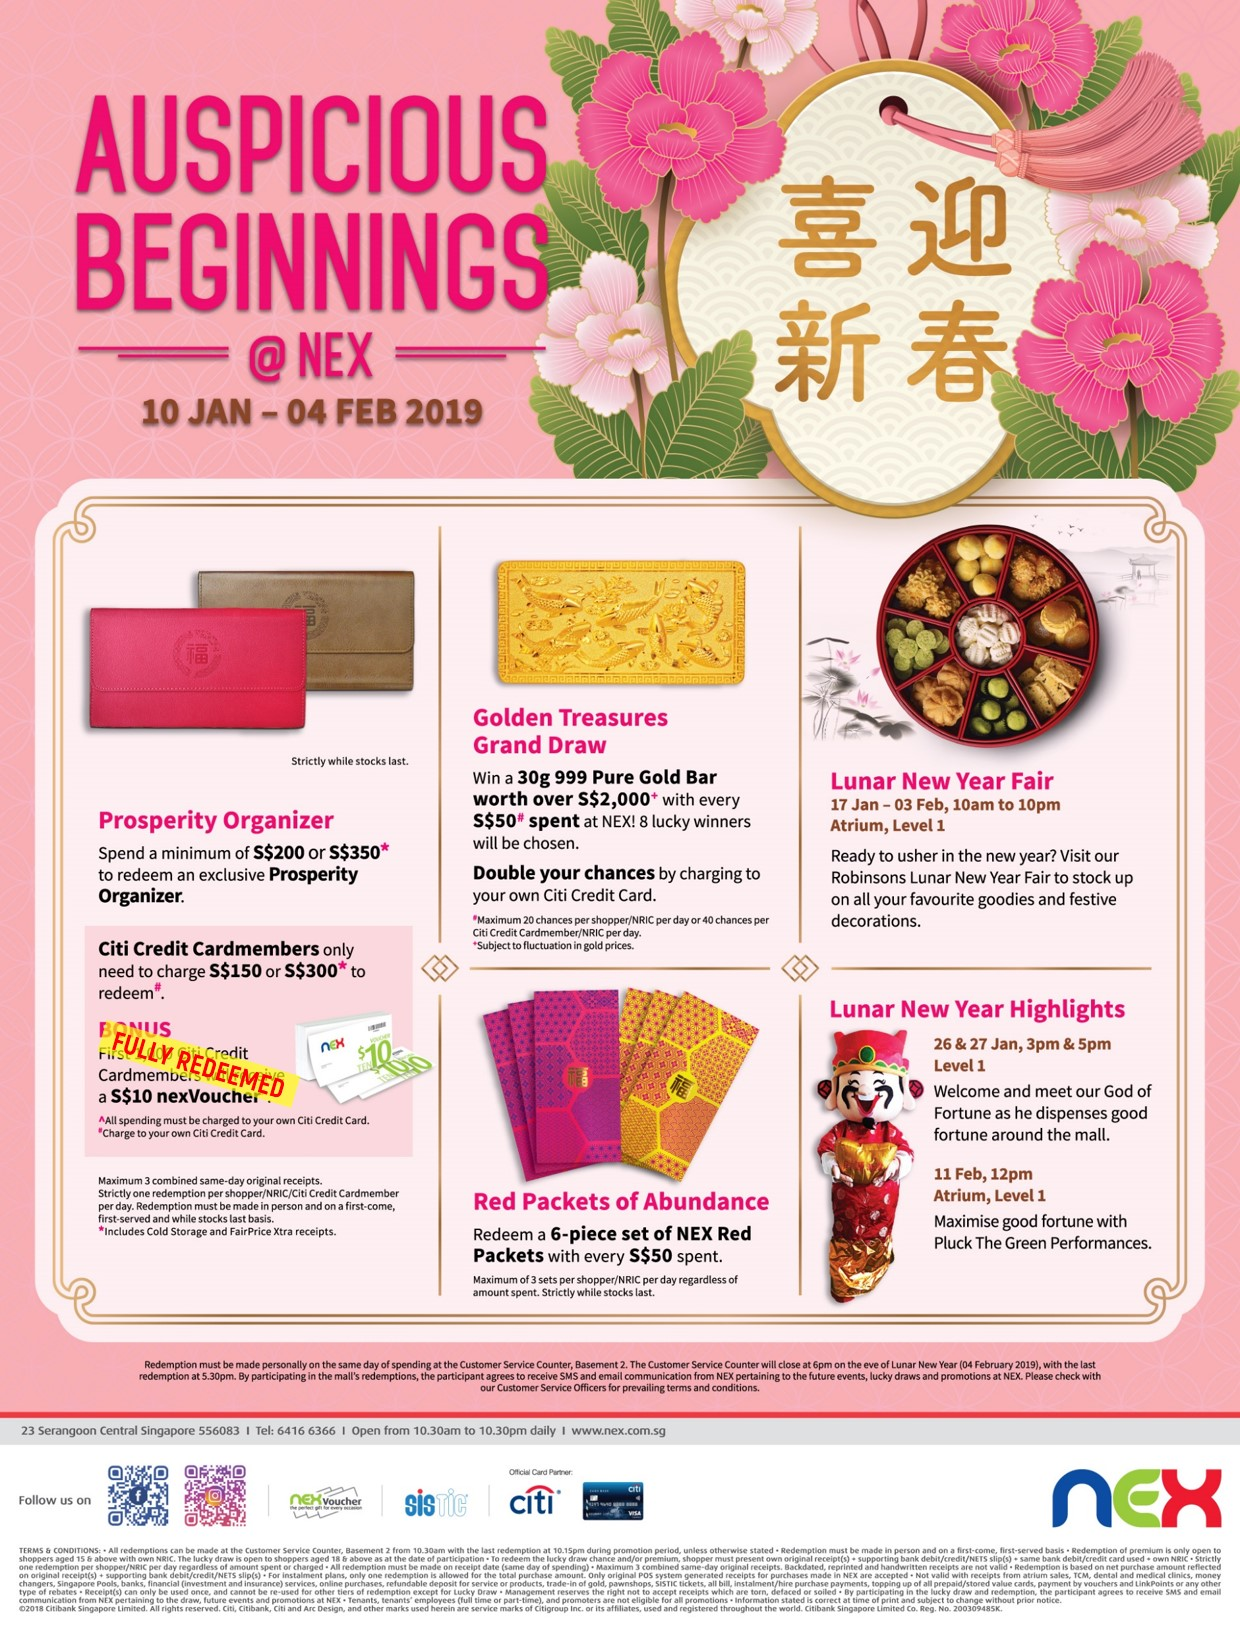 3902NEX_Lunar New Year 2019 Campaign_ST ad_8Jan_FA2_CITIBANK_FULLYREDEEMED